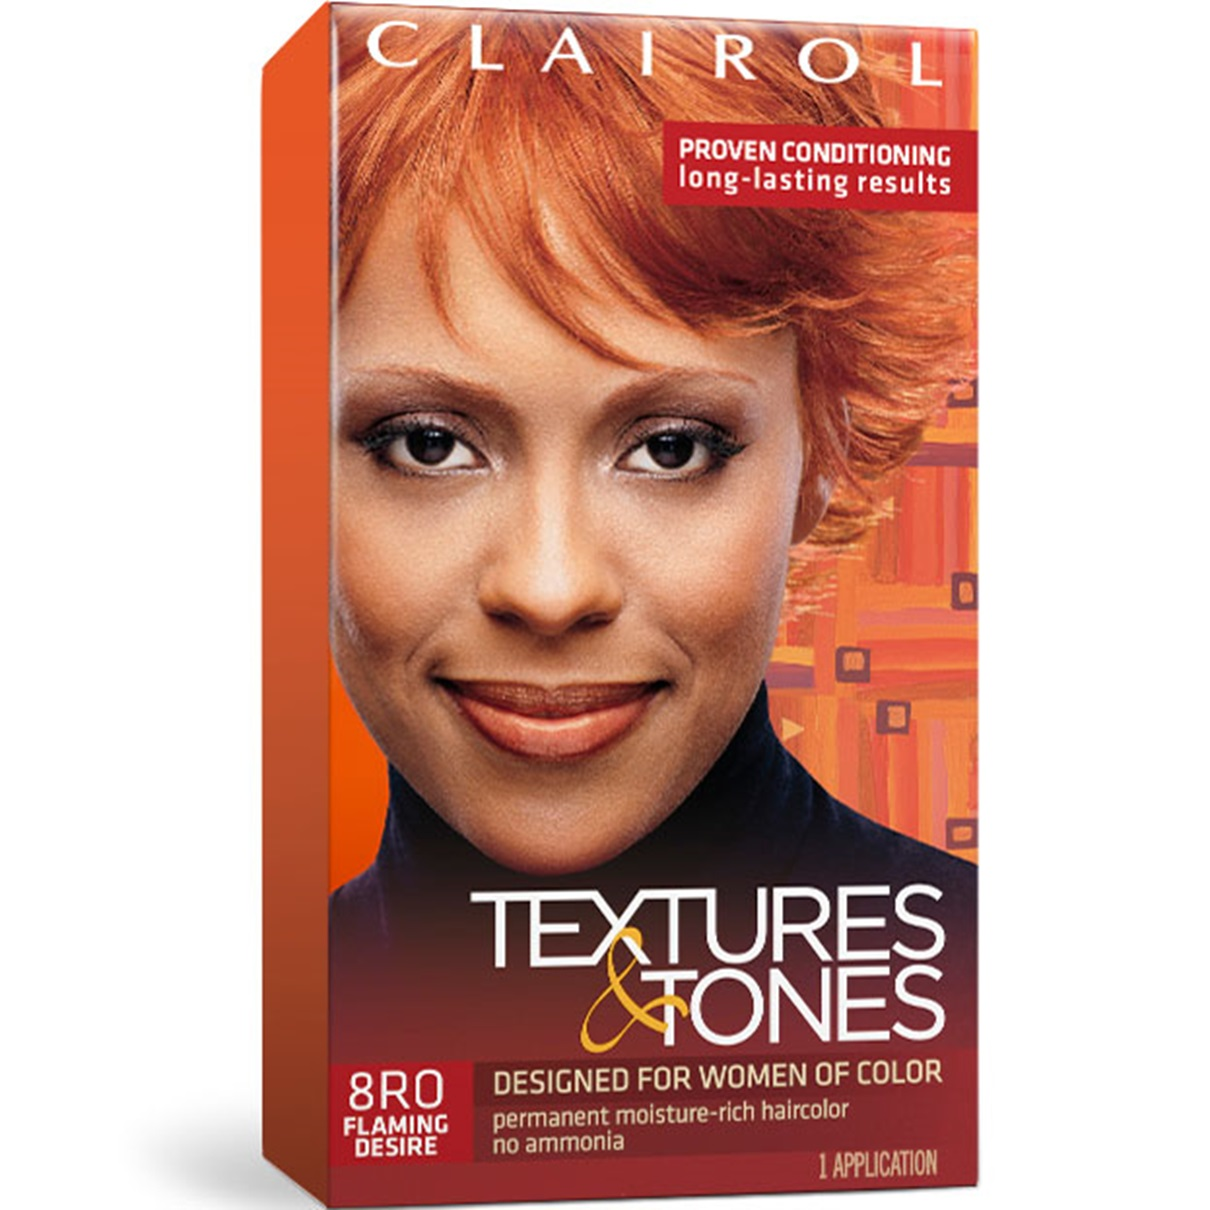 [CLAIROL] TEXTURES & TONES PERMANENT HAIR COLOR DYE KIT 1